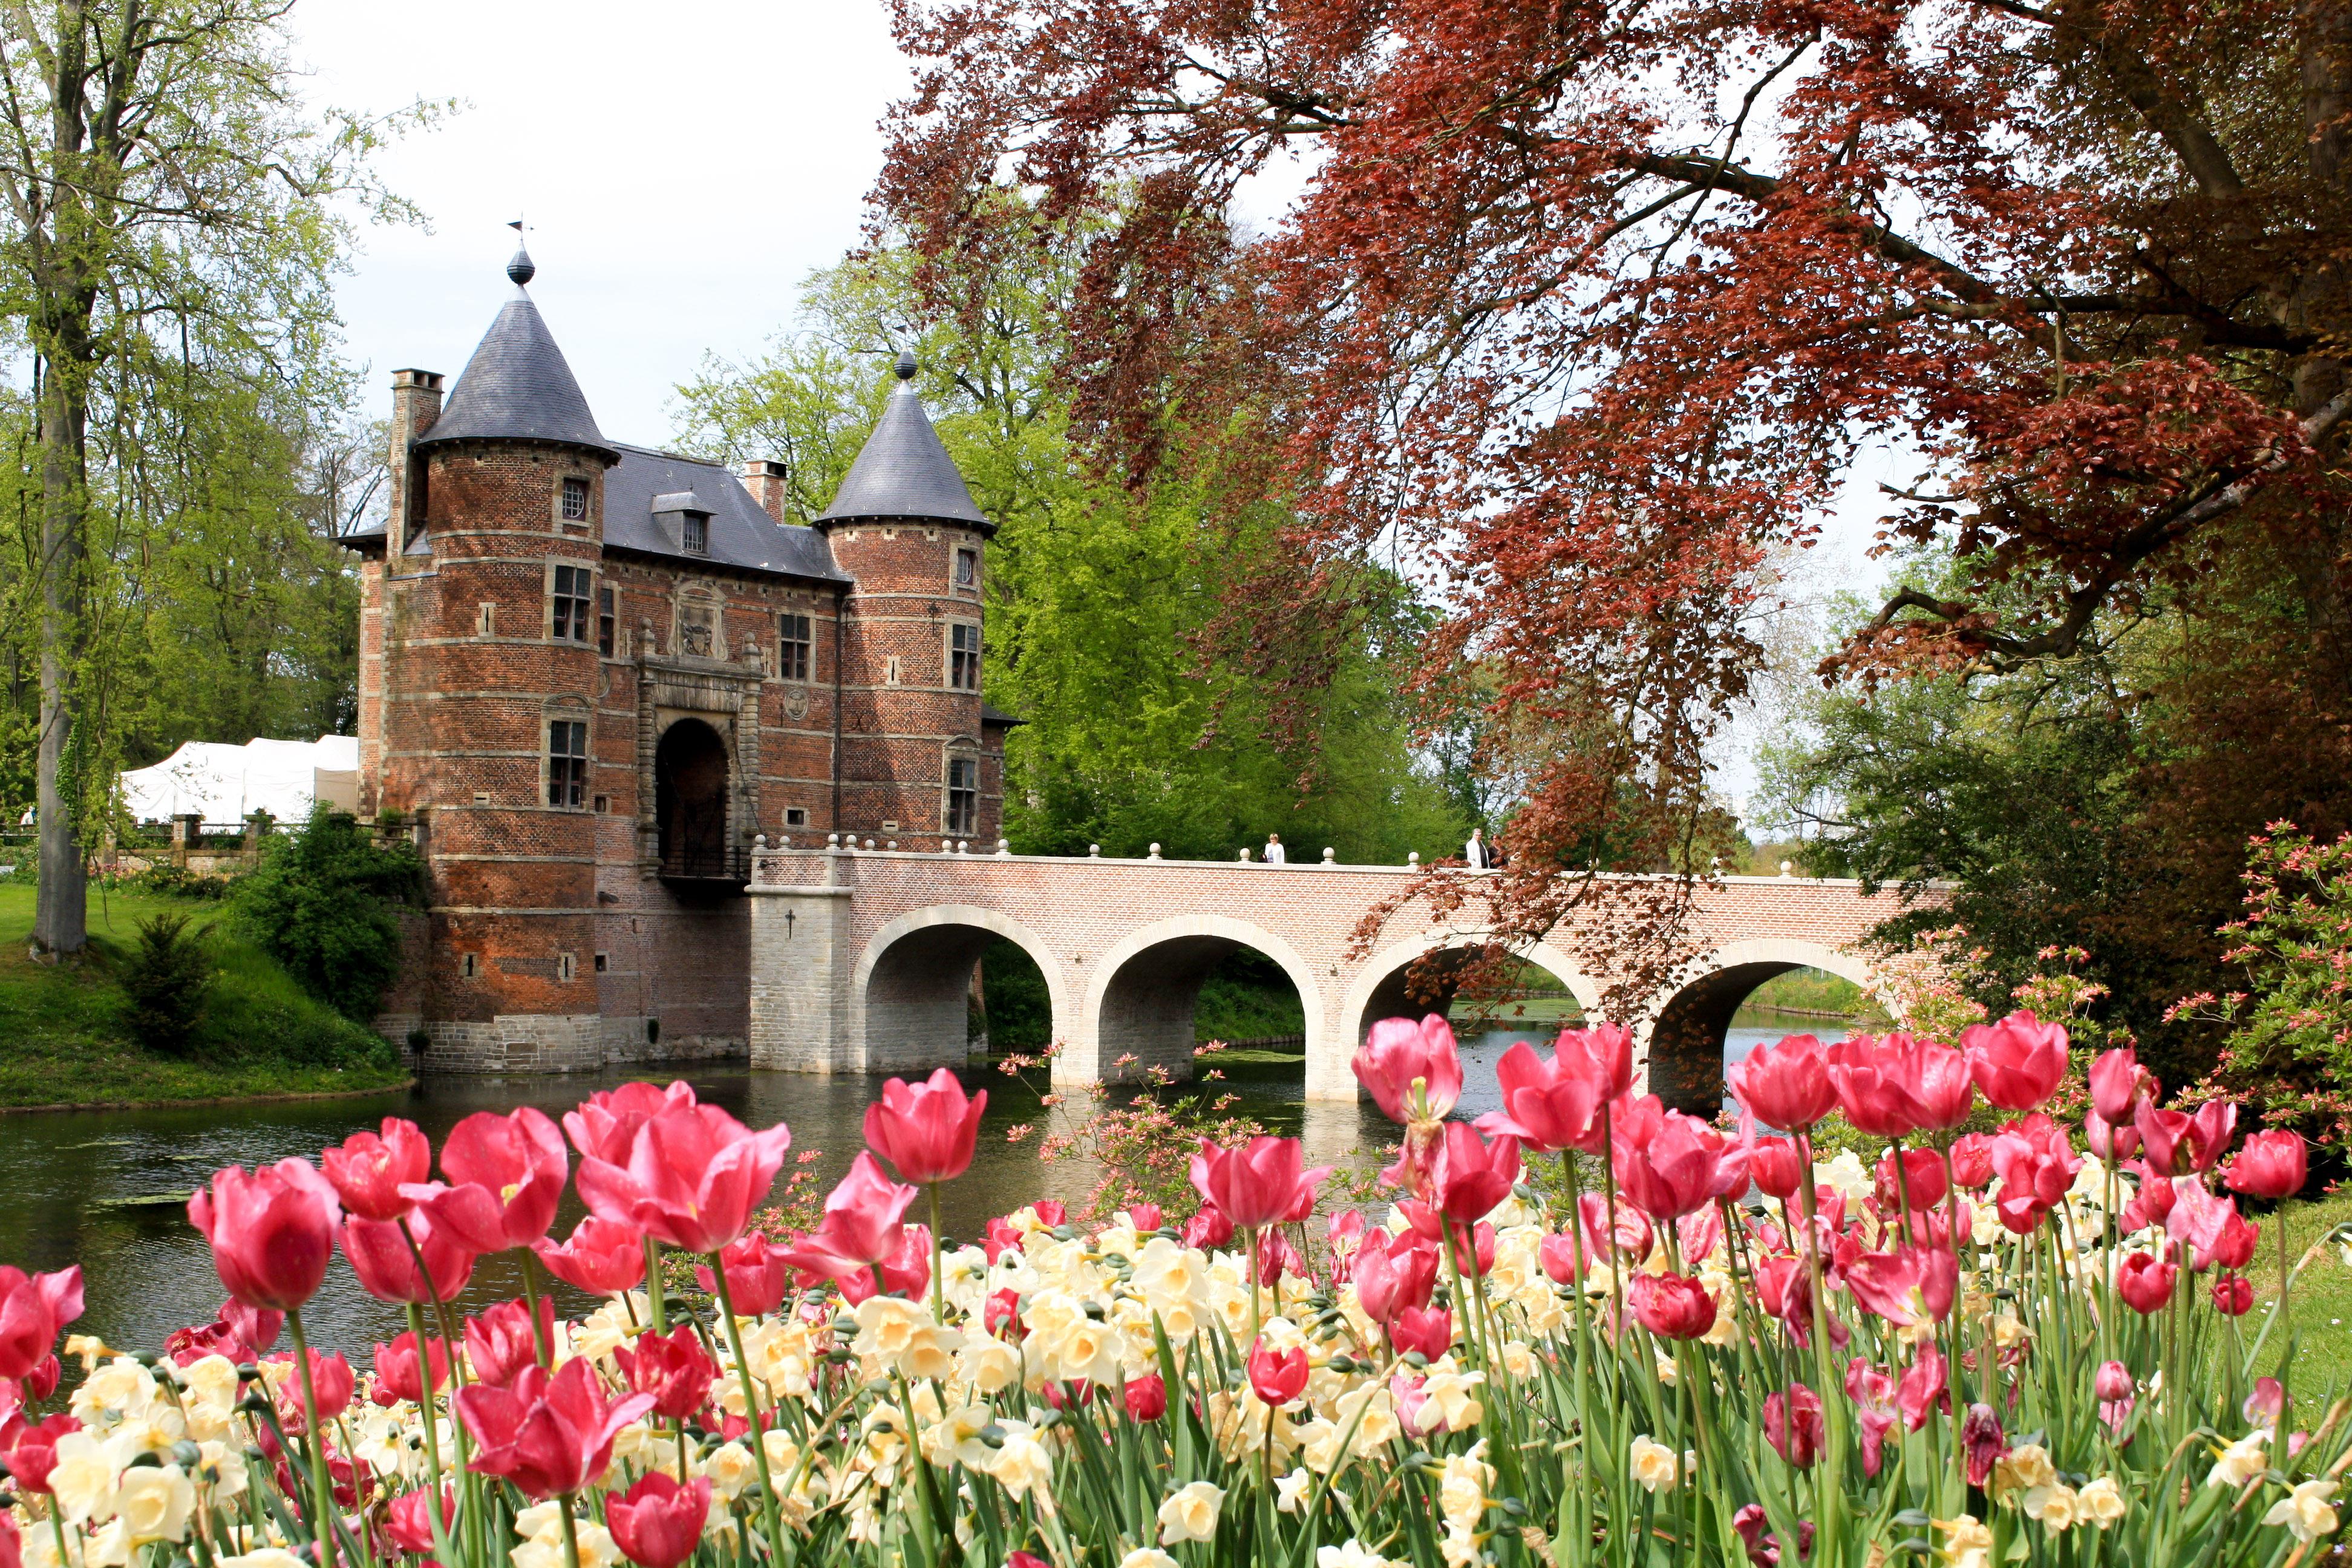 Groot-Bijgaarden Castle: A Floralia Brussels Photo Essay ...